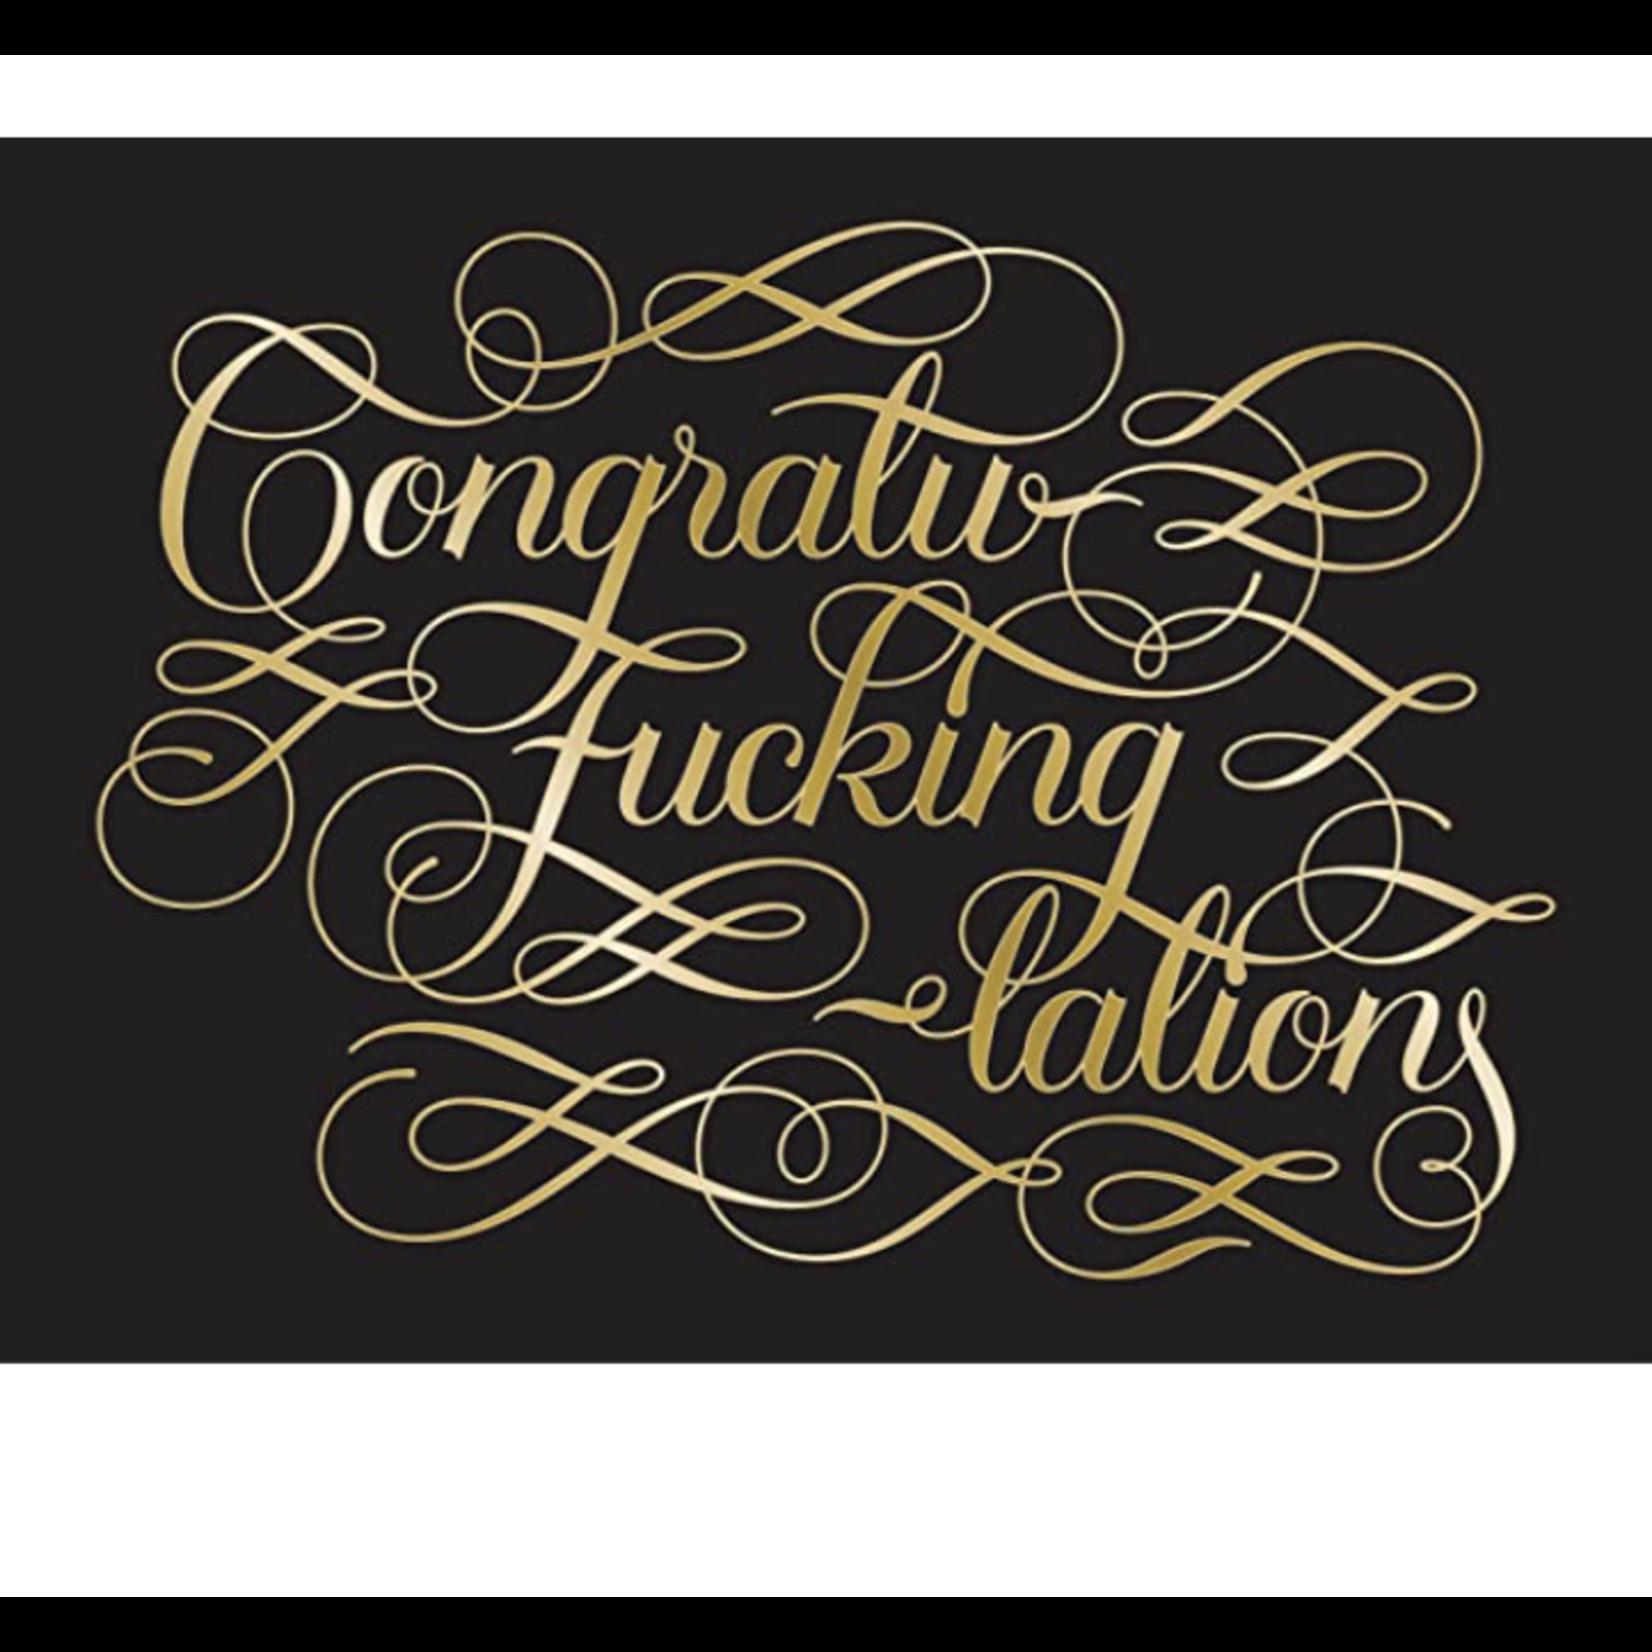 Card - Congrat-fucking-lations